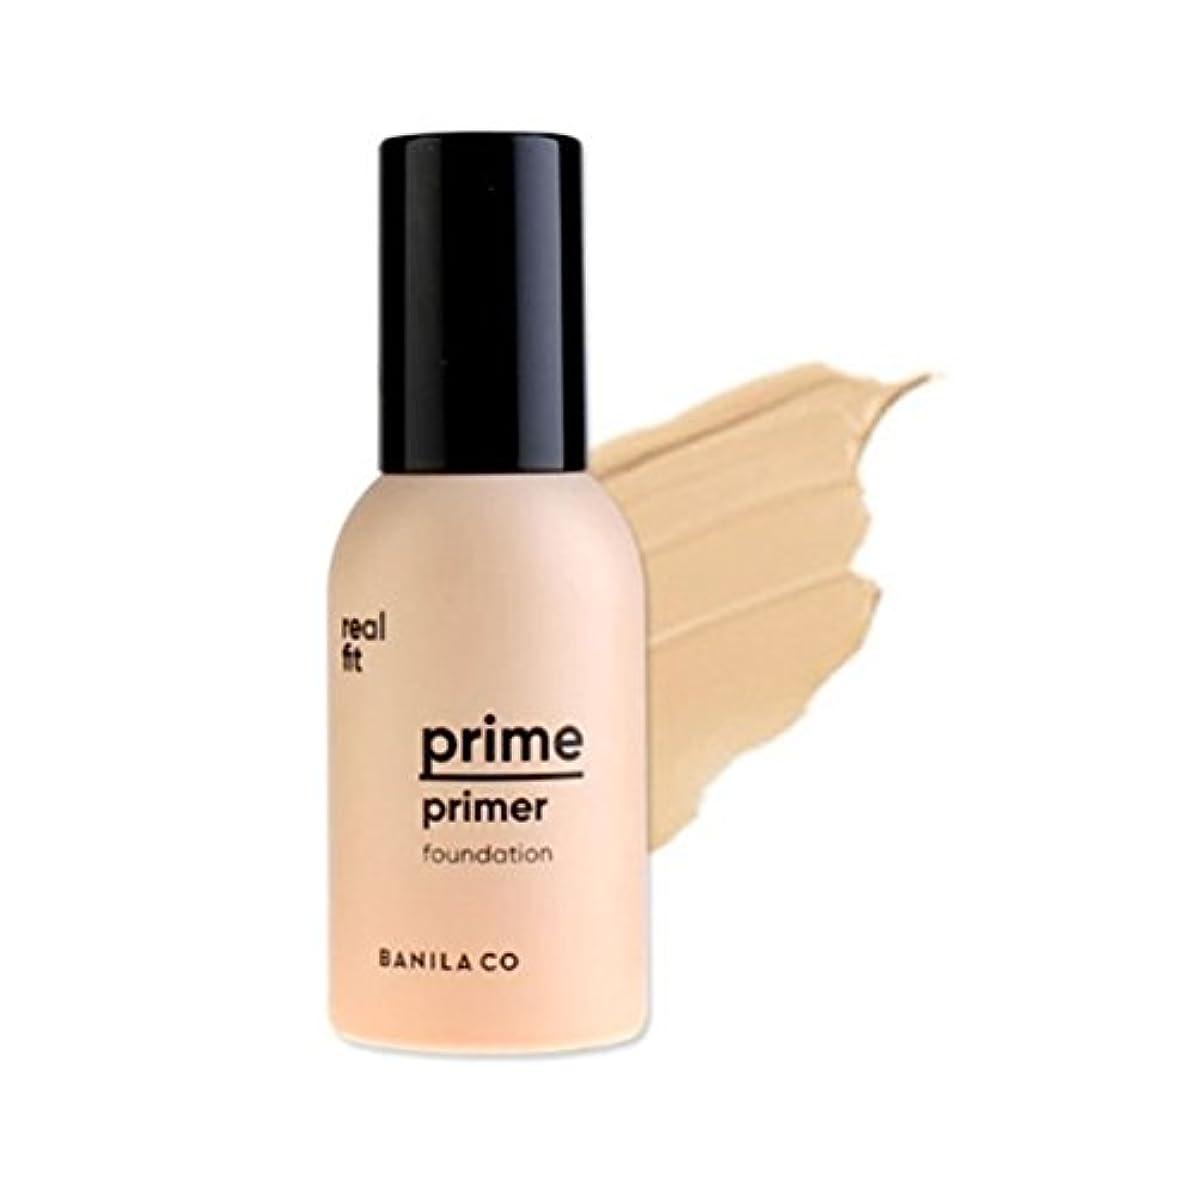 [Renewal] BANILA CO Prime Primer Fitting Foundation 30ml/バニラコ プライム プライマー フィッティング ファンデーション 30ml (#BE15) [並行輸入品]